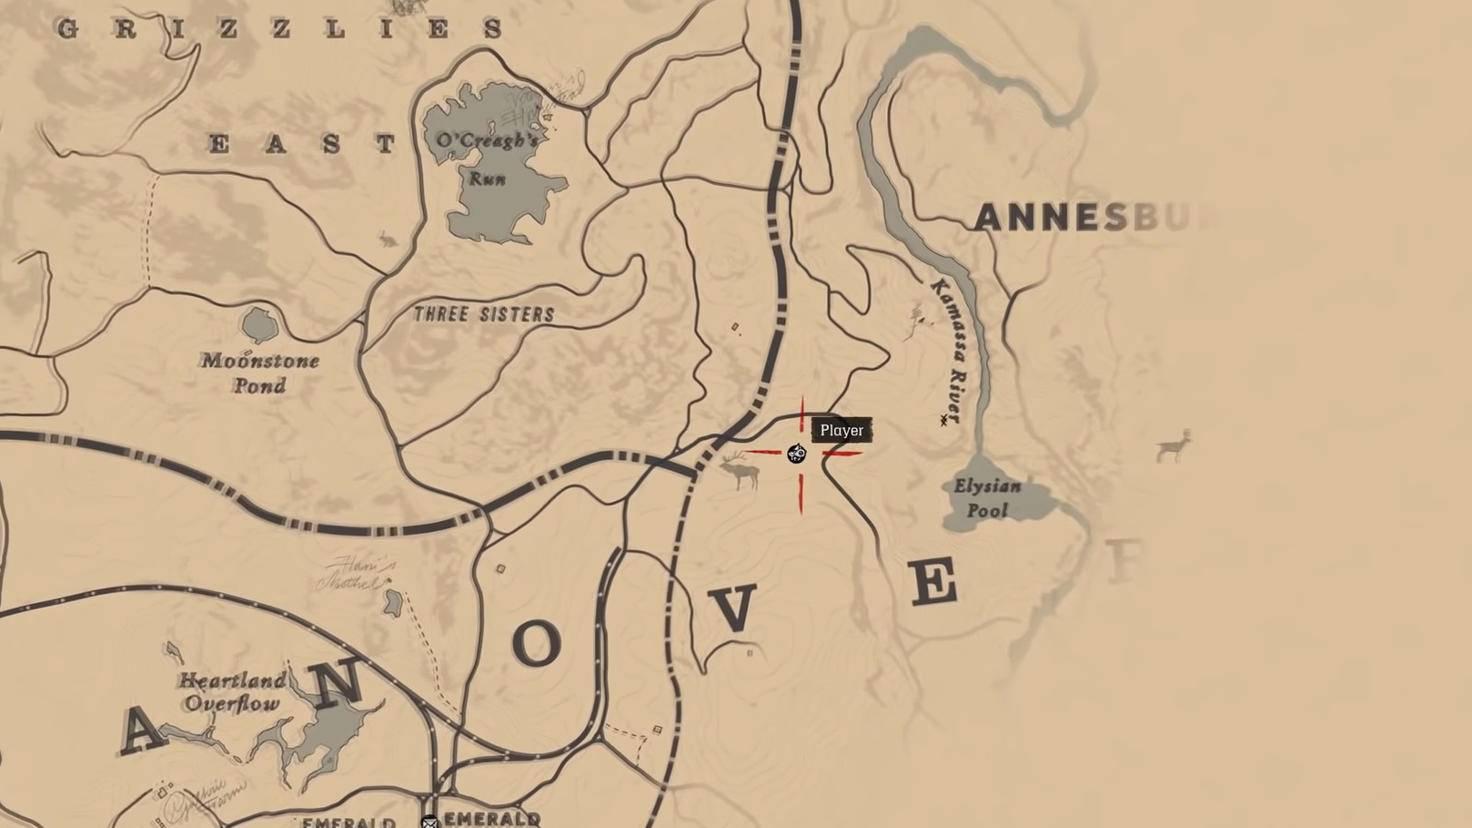 Standort des Trappers in Annesburg.